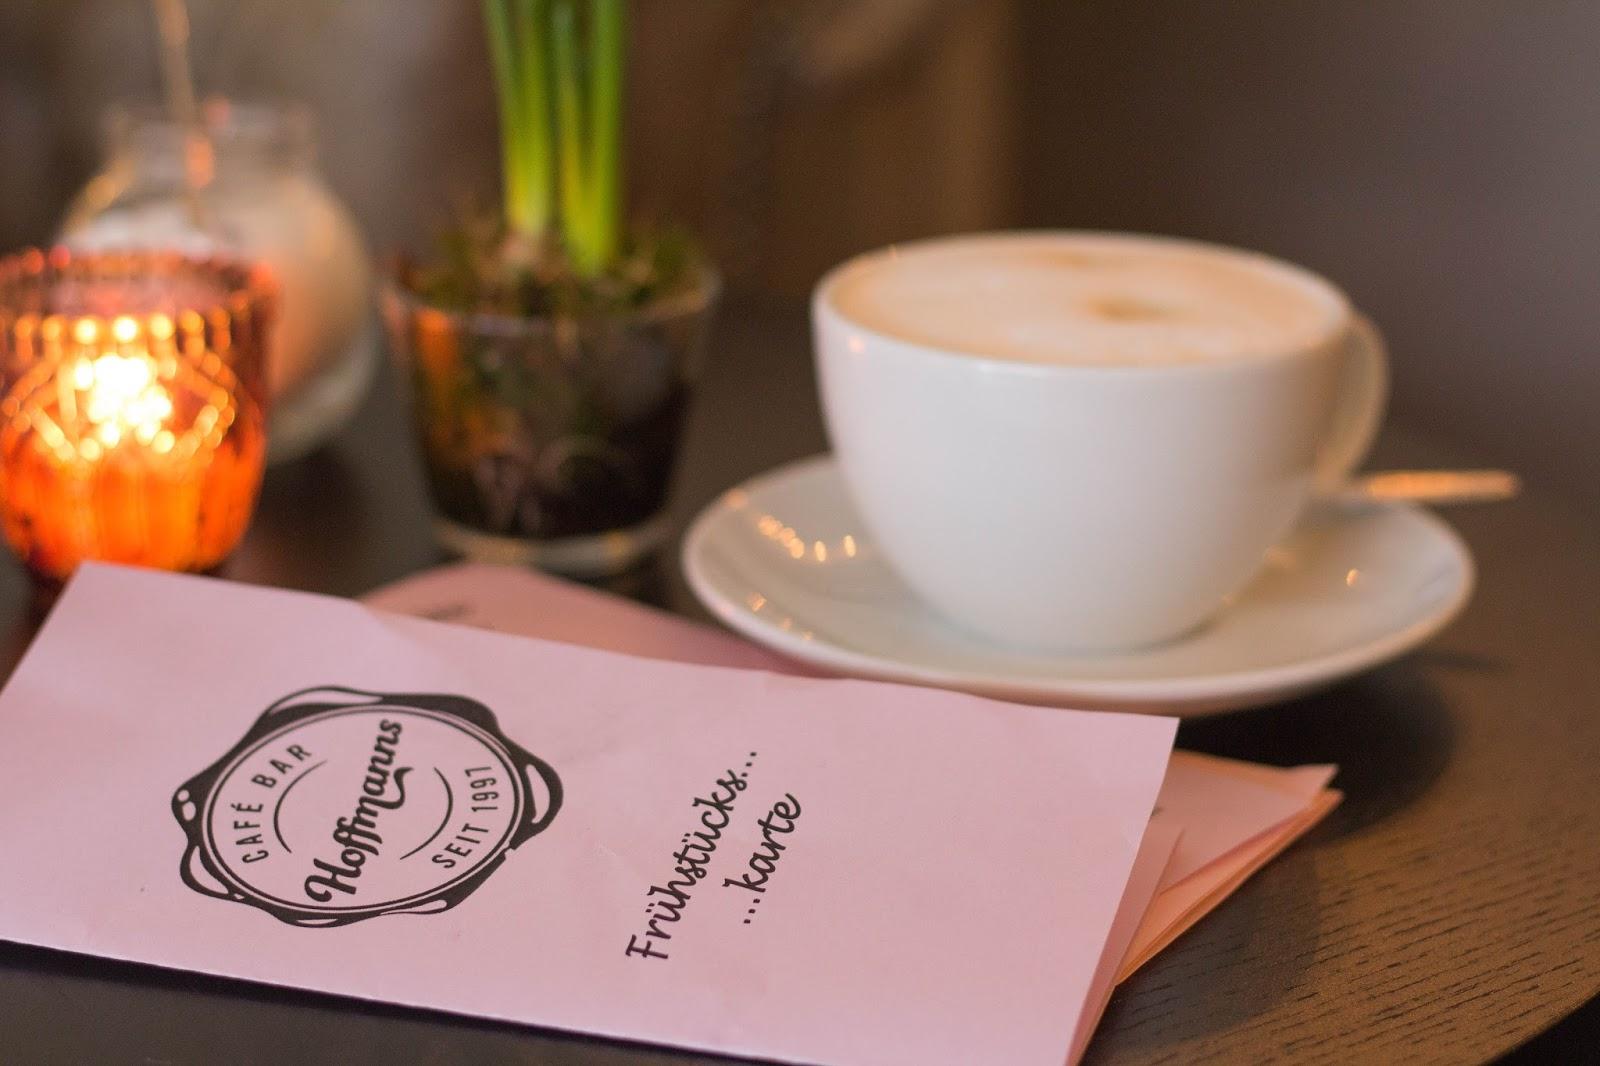 Cafe Hoffmann Mönchengladbach